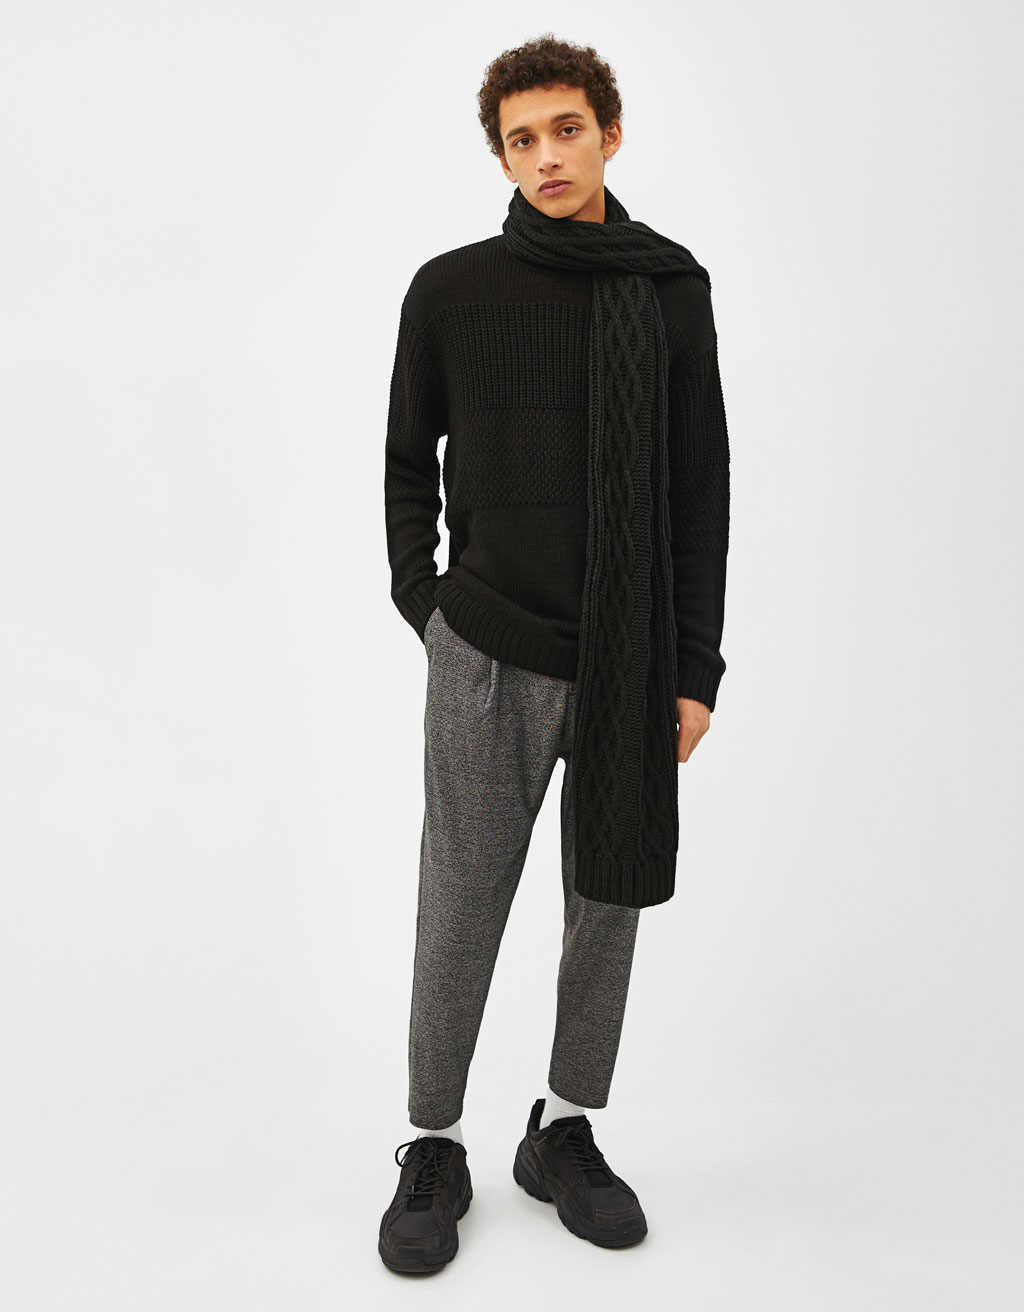 Sweater de malha combinada